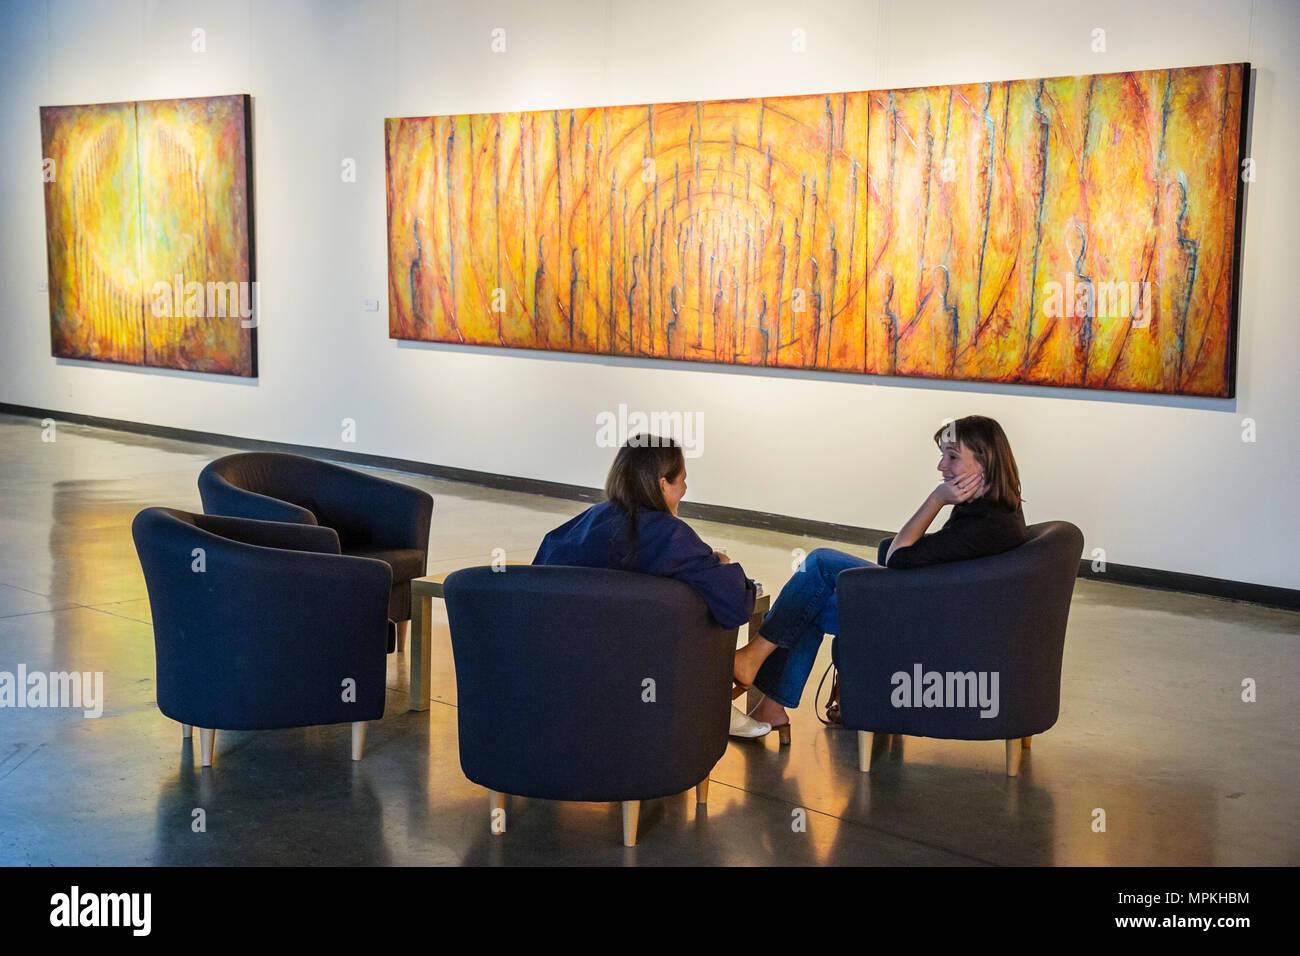 Montreal Canada Saint Michel District Le Pavillon de La Tohu urban green space gallery painting women talk Stock Photo